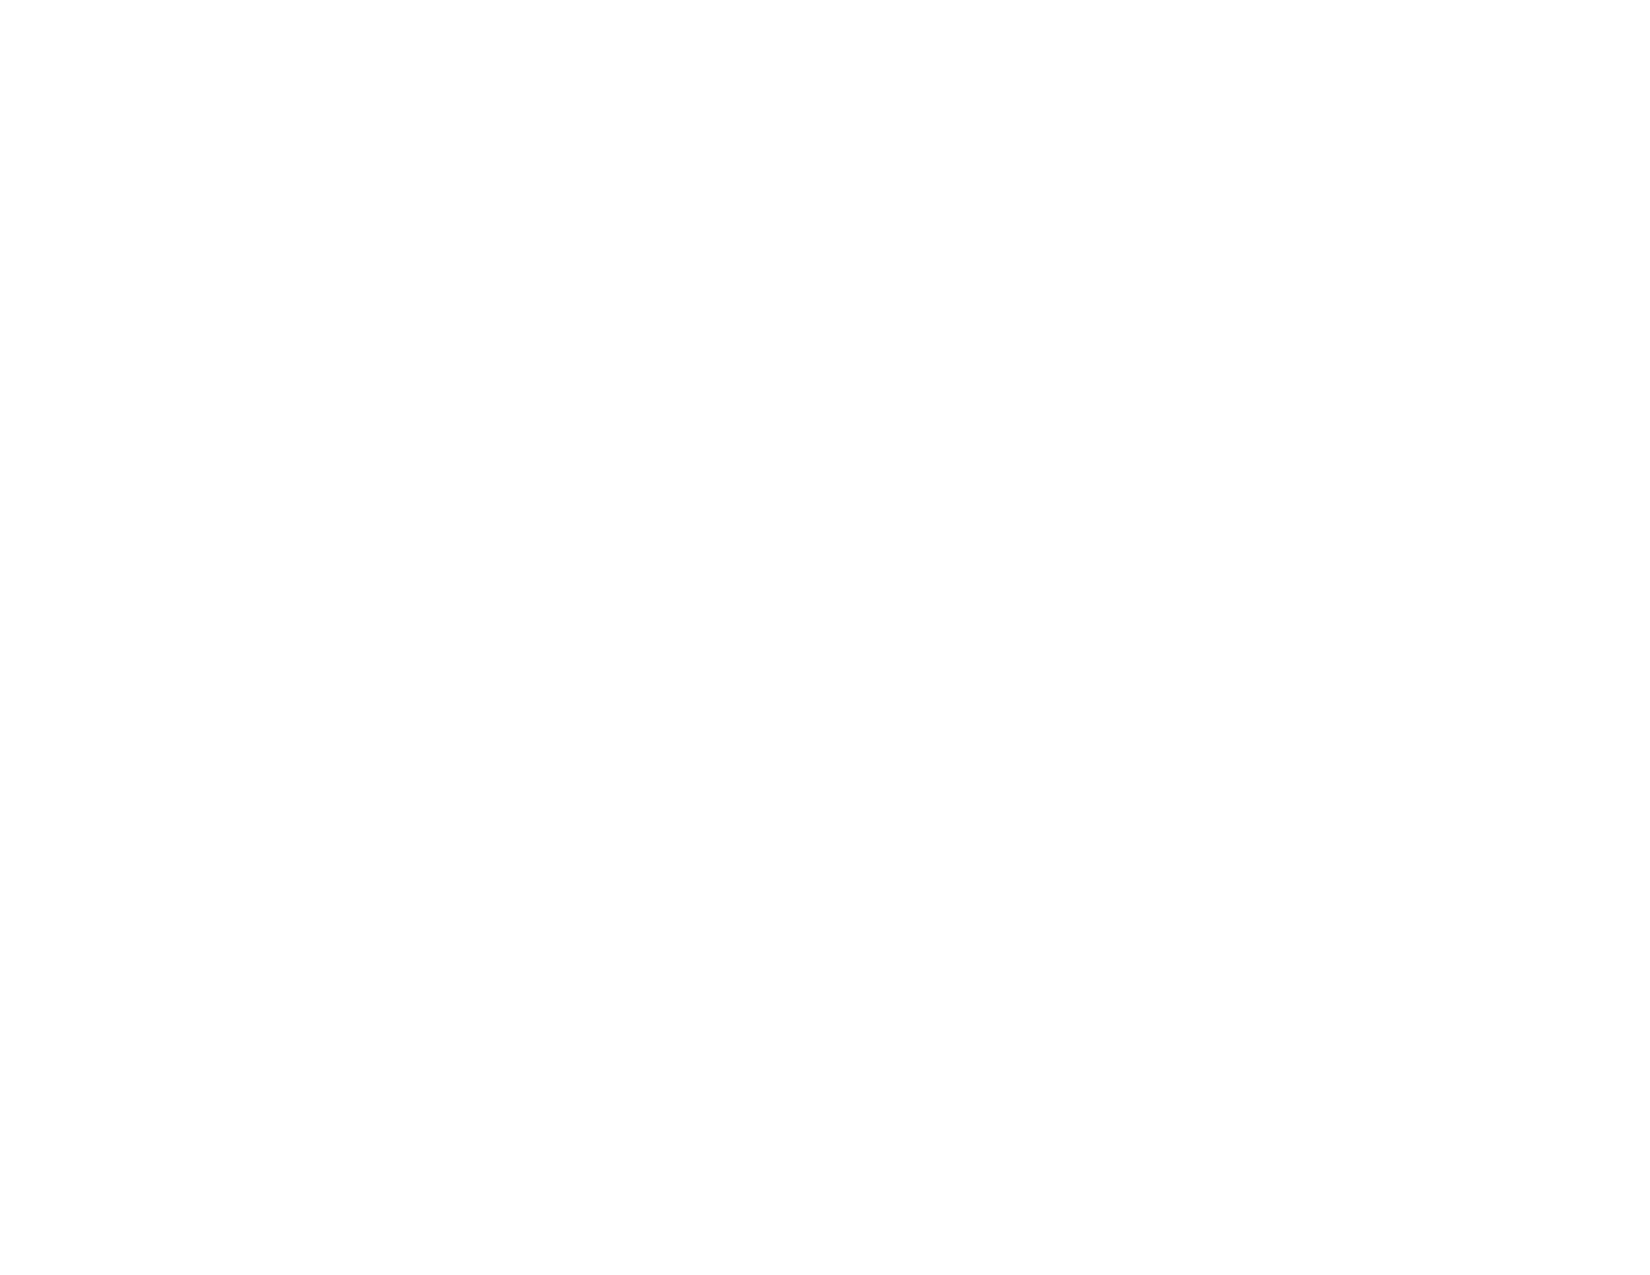 http://sigmabusinesscenter.com/wp-content/uploads/2021/05/Logo-Sigma-01.png